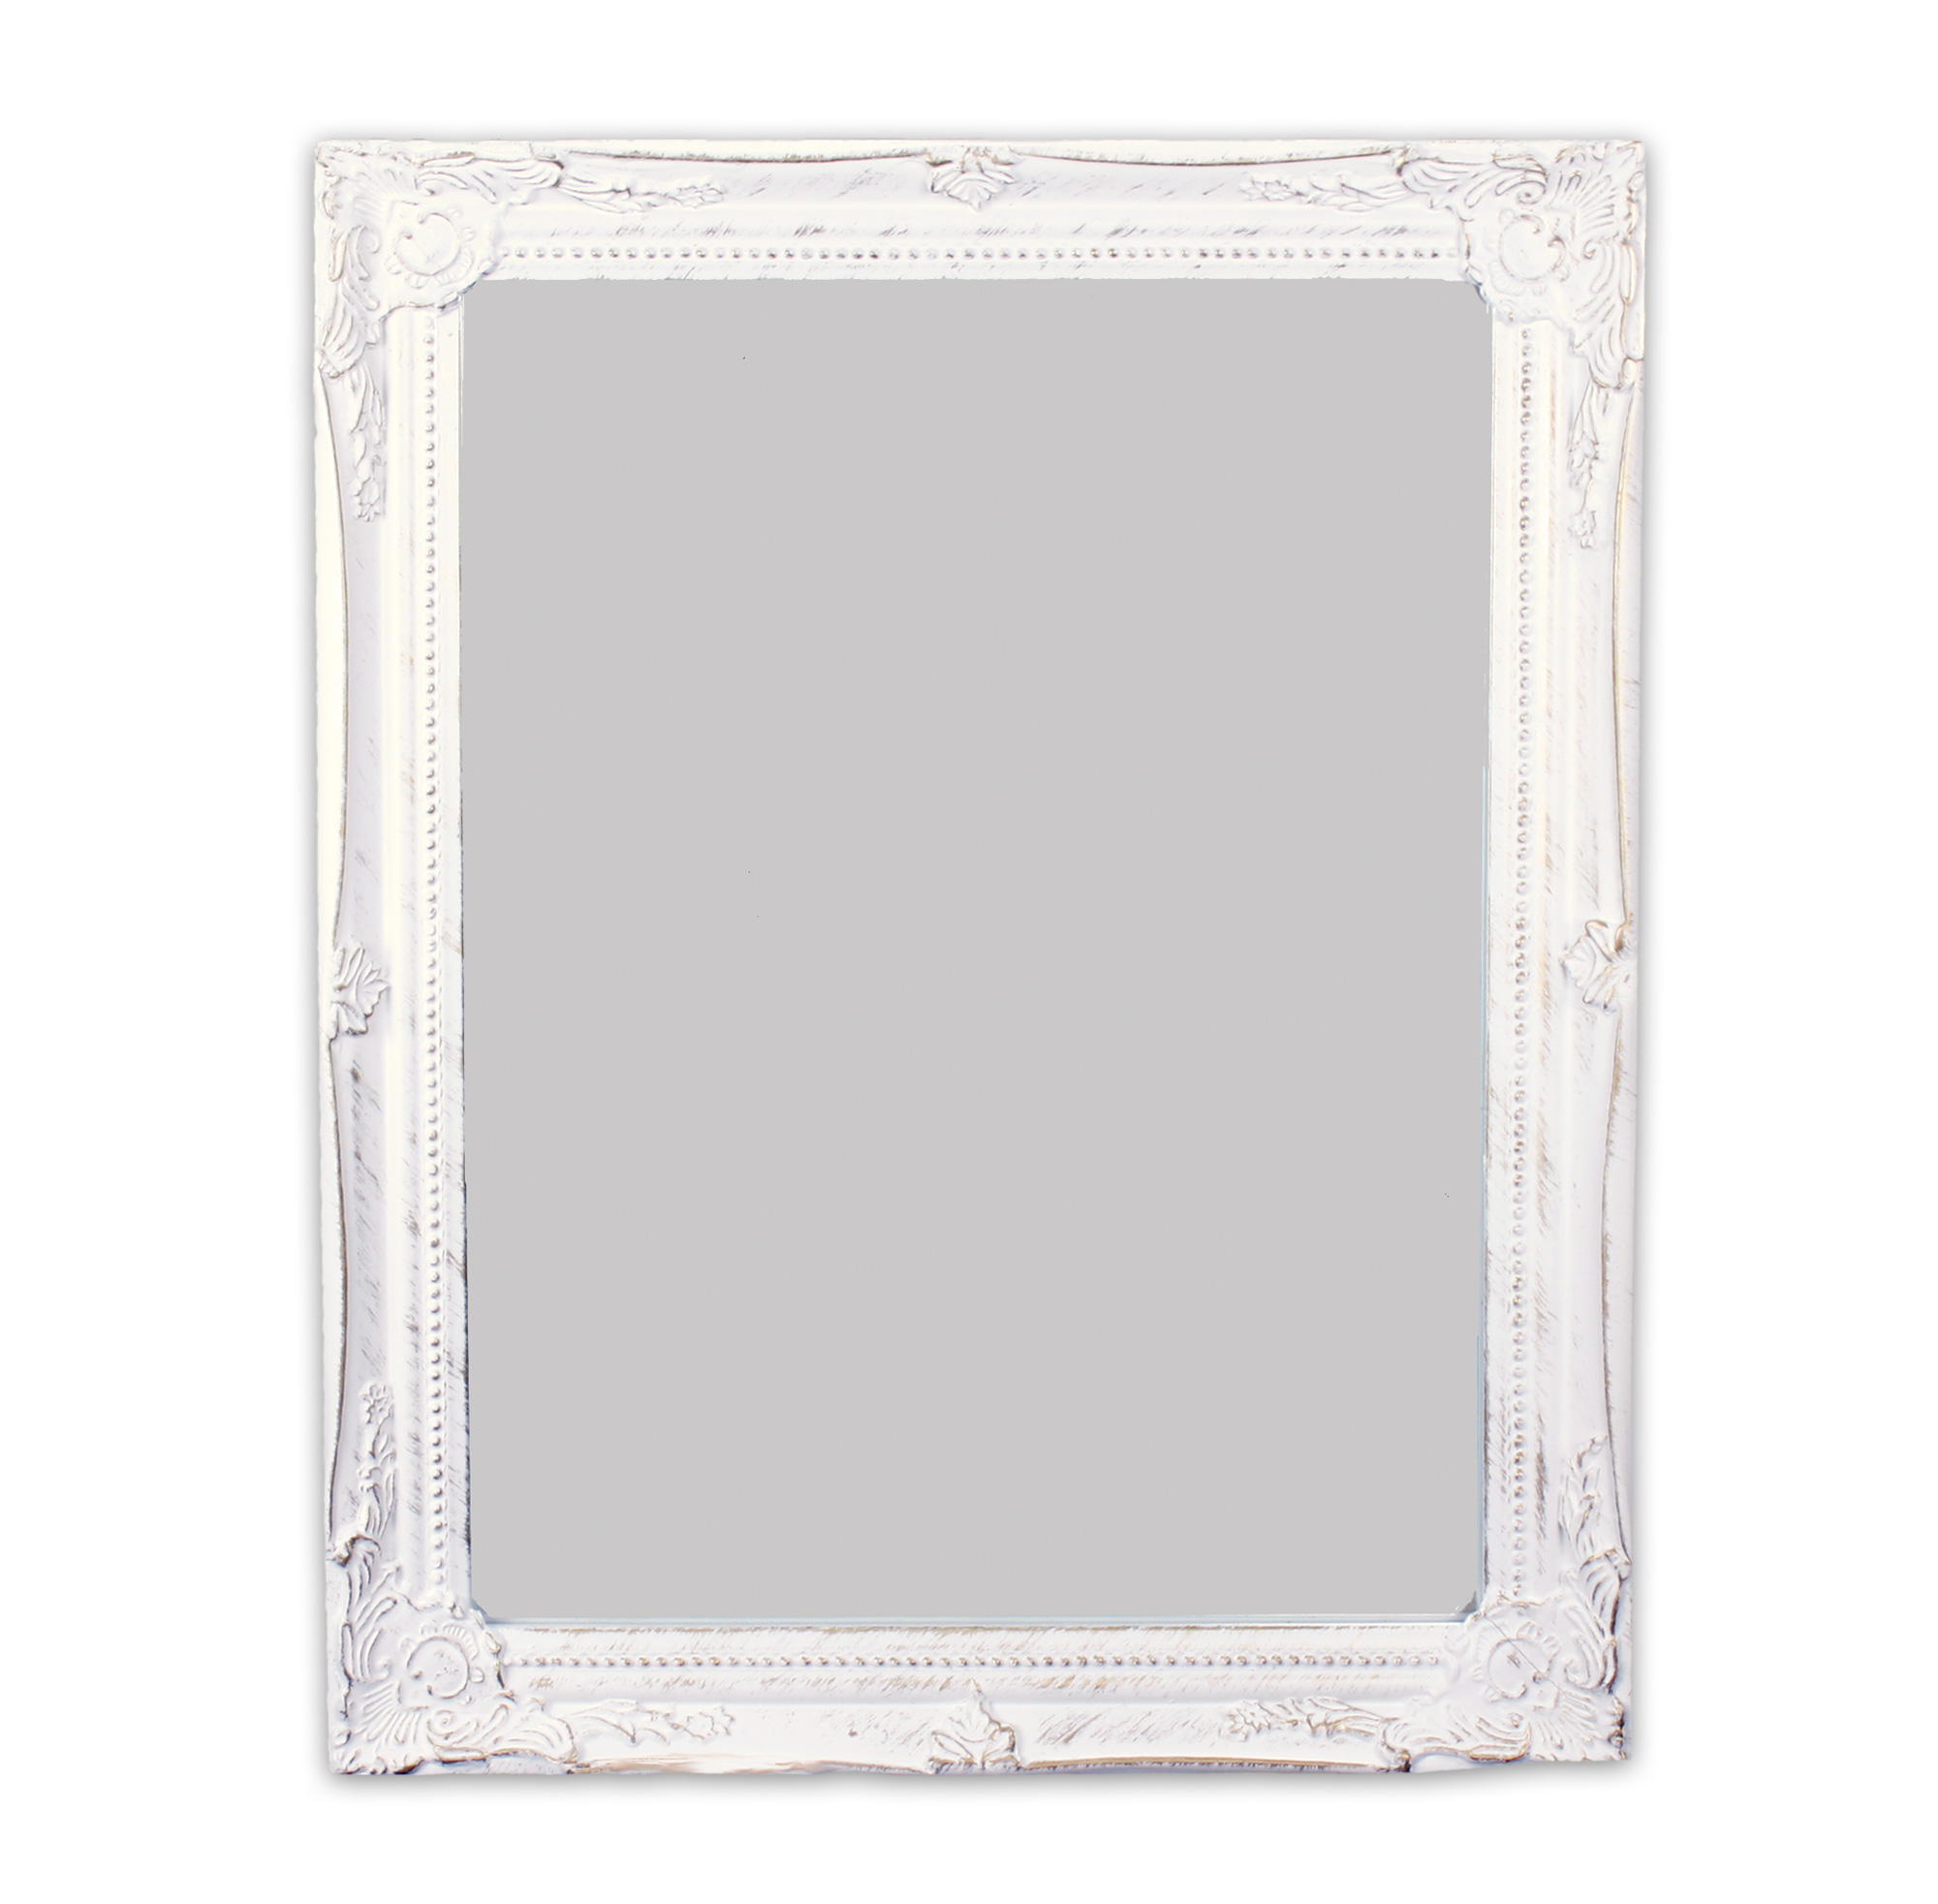 Moderne mirroir miroir mural de sale bain couloir for Encadrement miroir